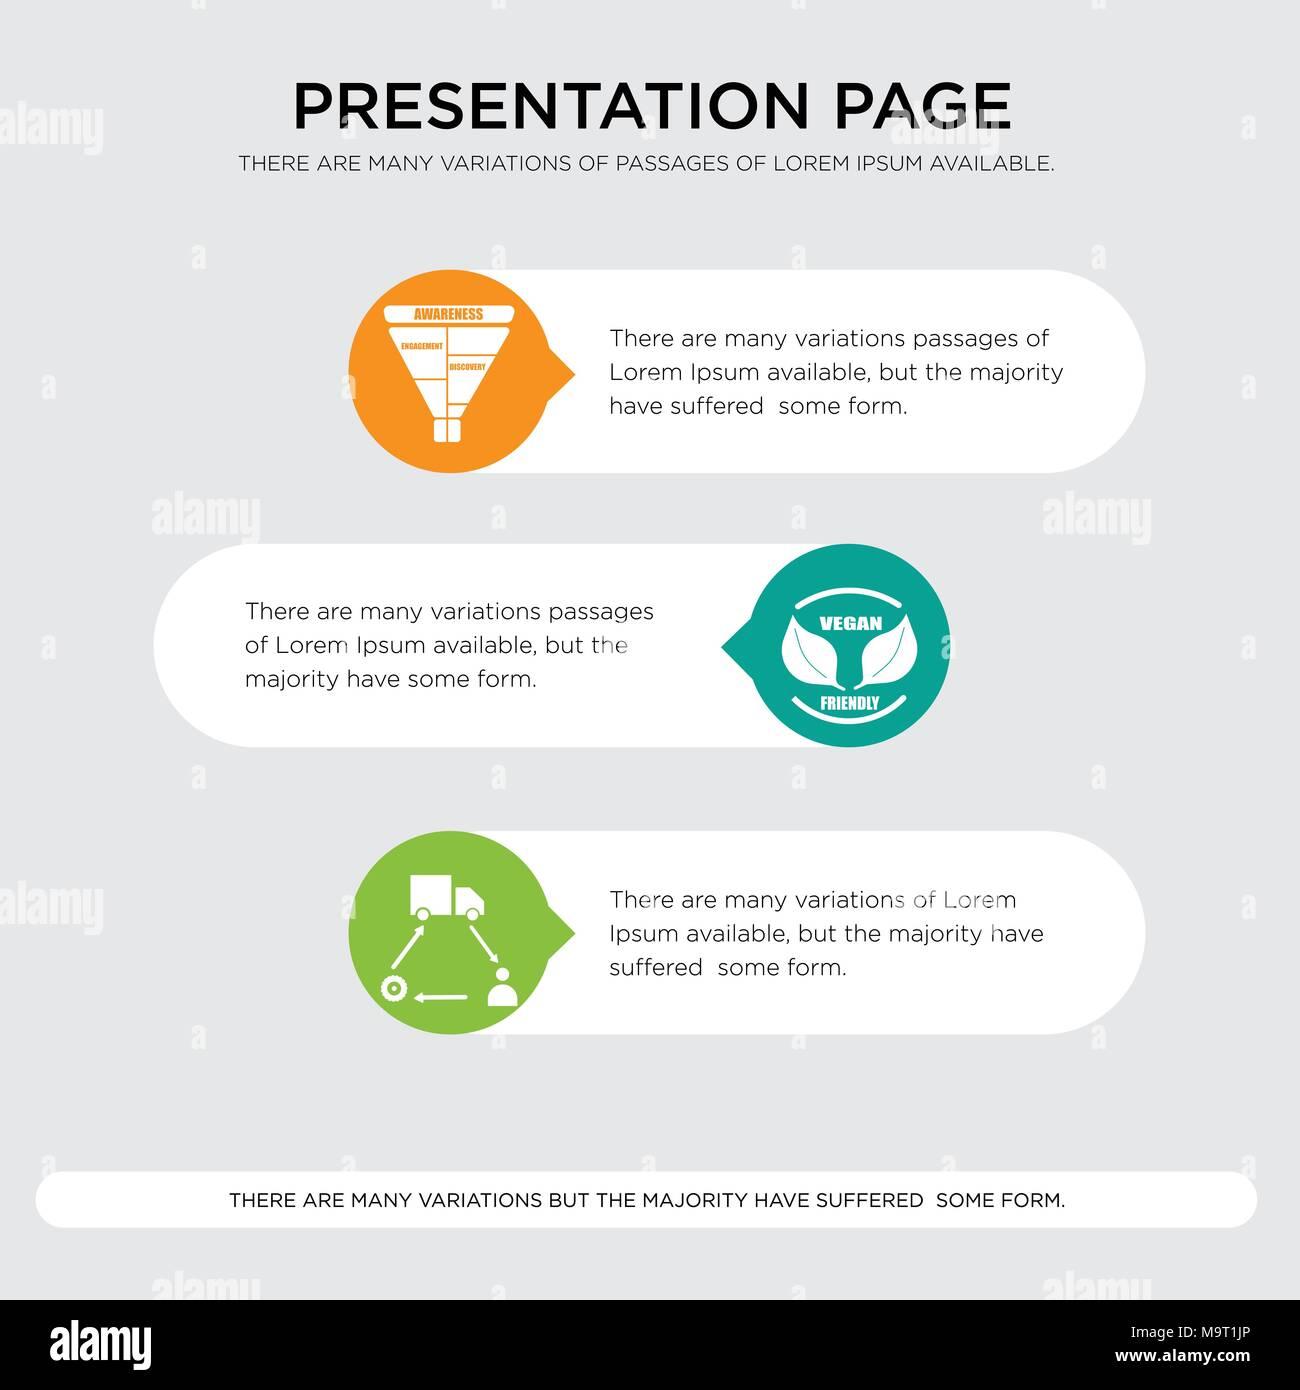 Supply Chain Vega Marketing Funnel Presentation Design Template In - Marketing funnel template